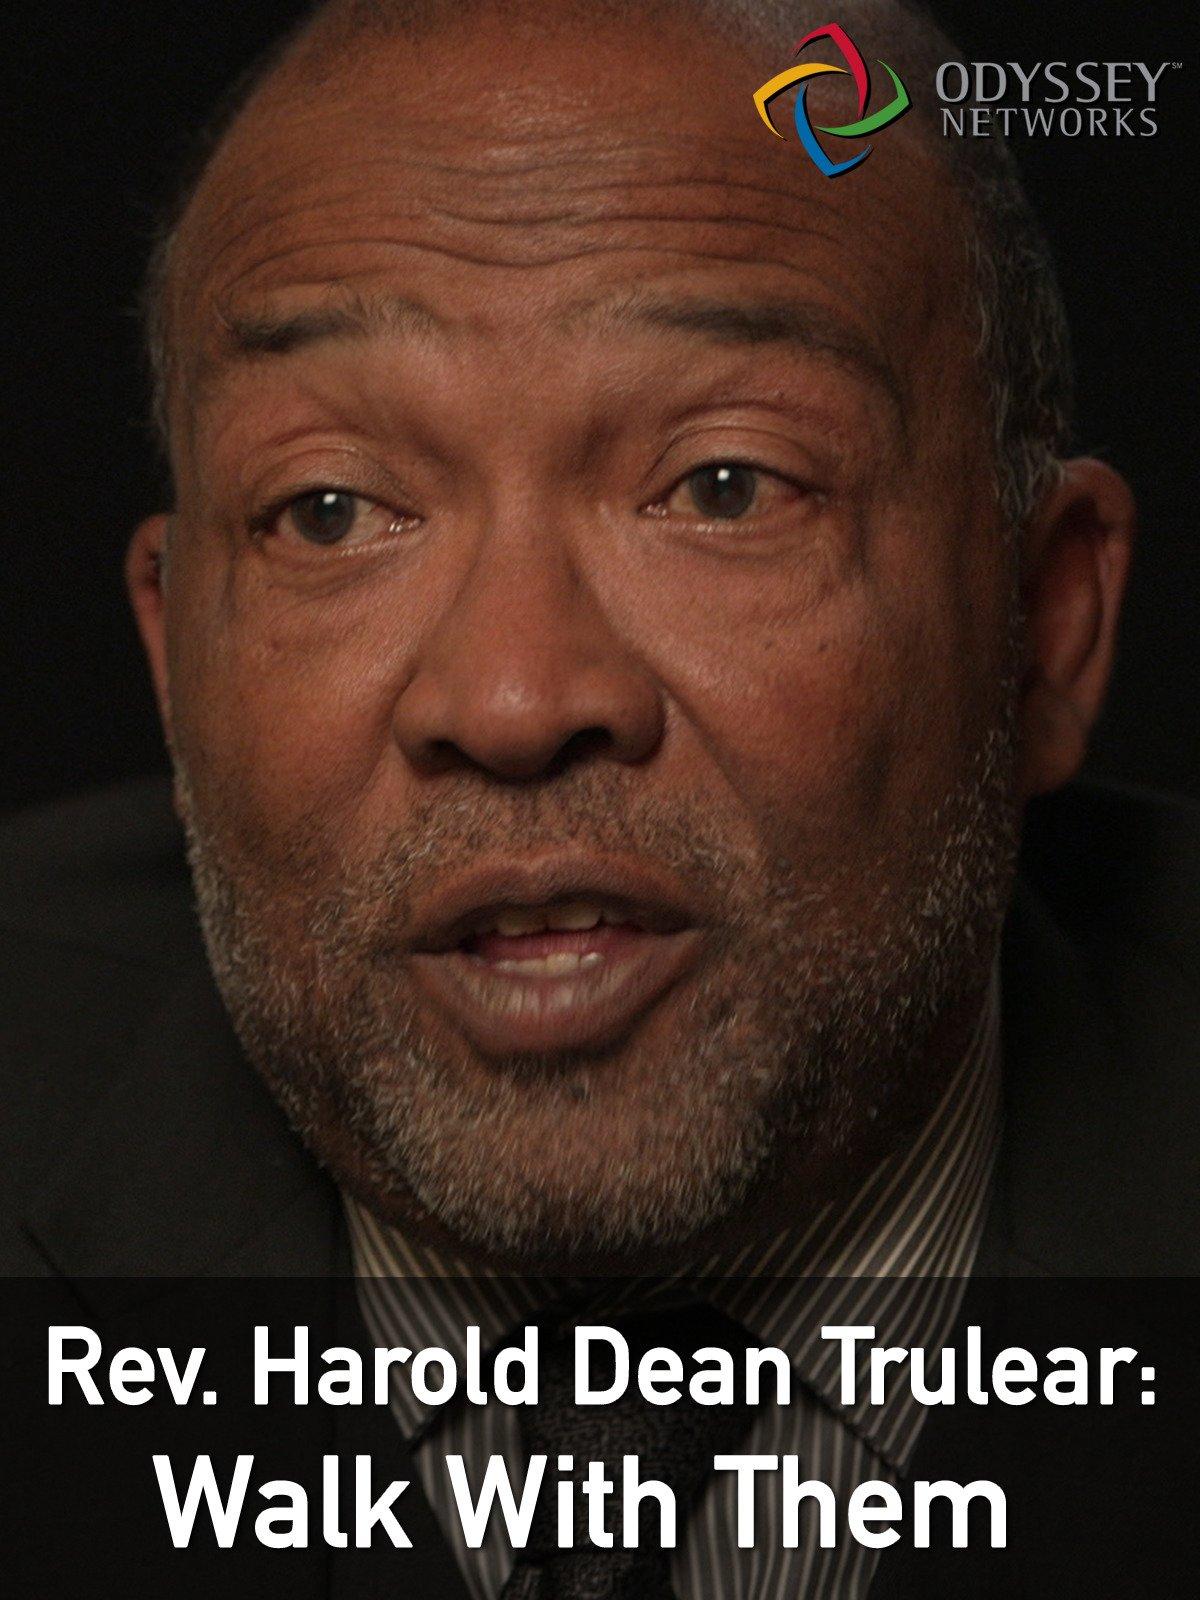 Clip: Rev. Harold Dean Trulear: Walk With Them